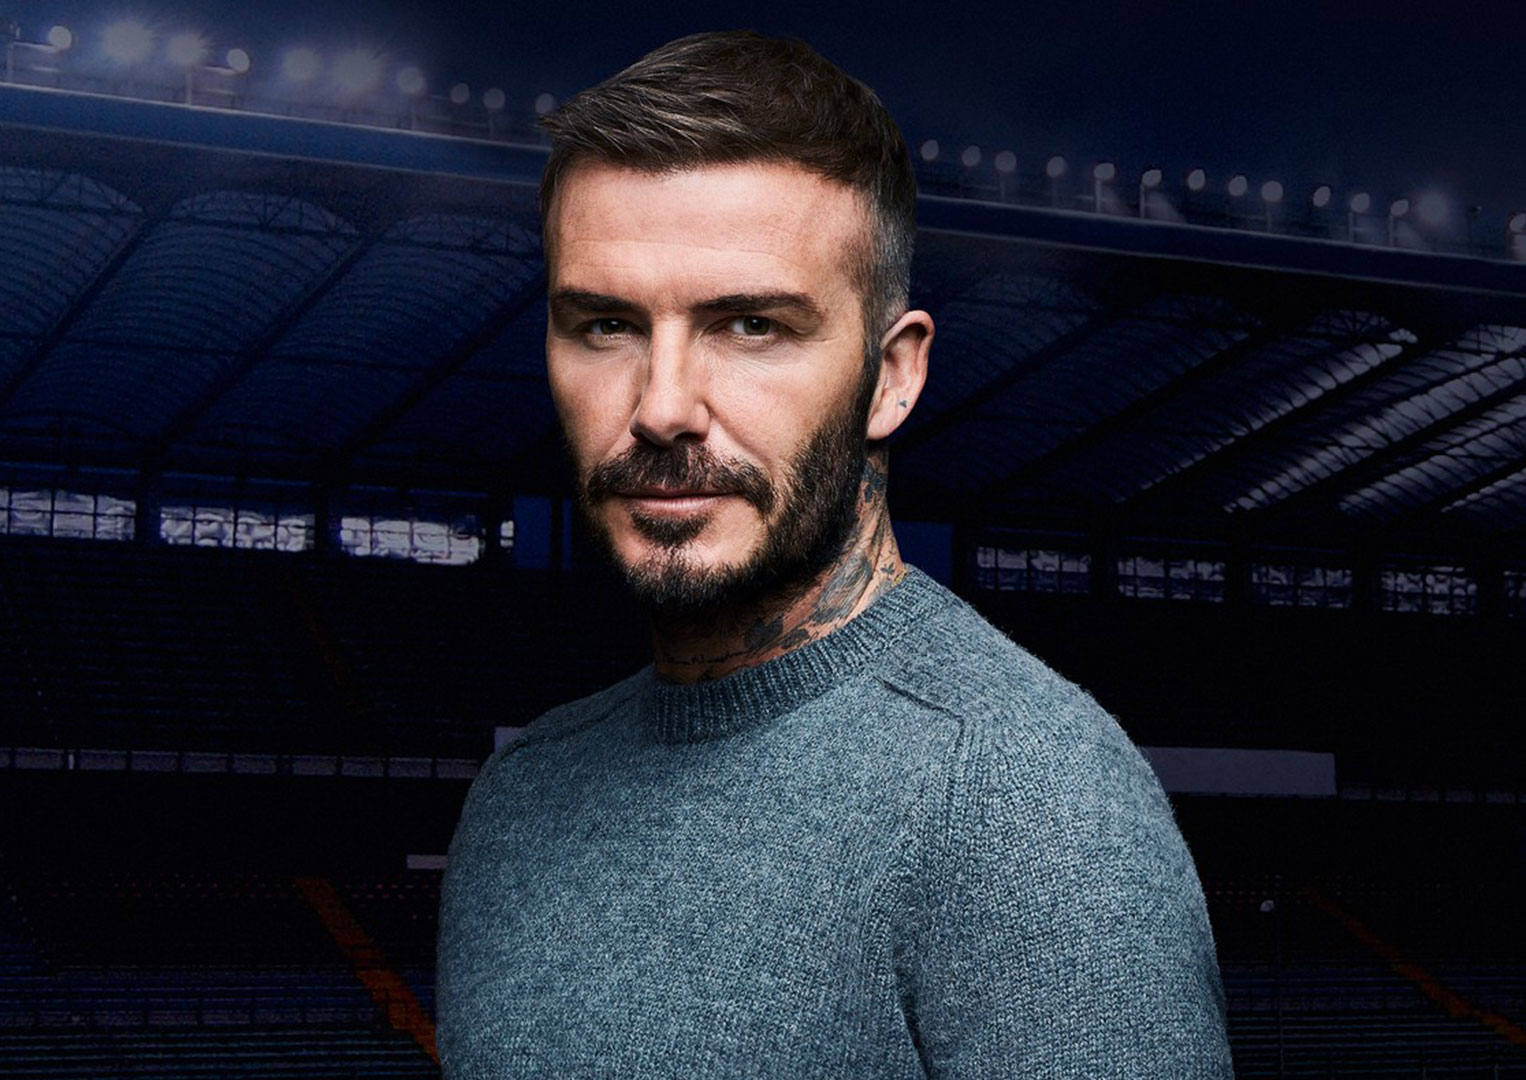 Tudor ambassador, David Beckham